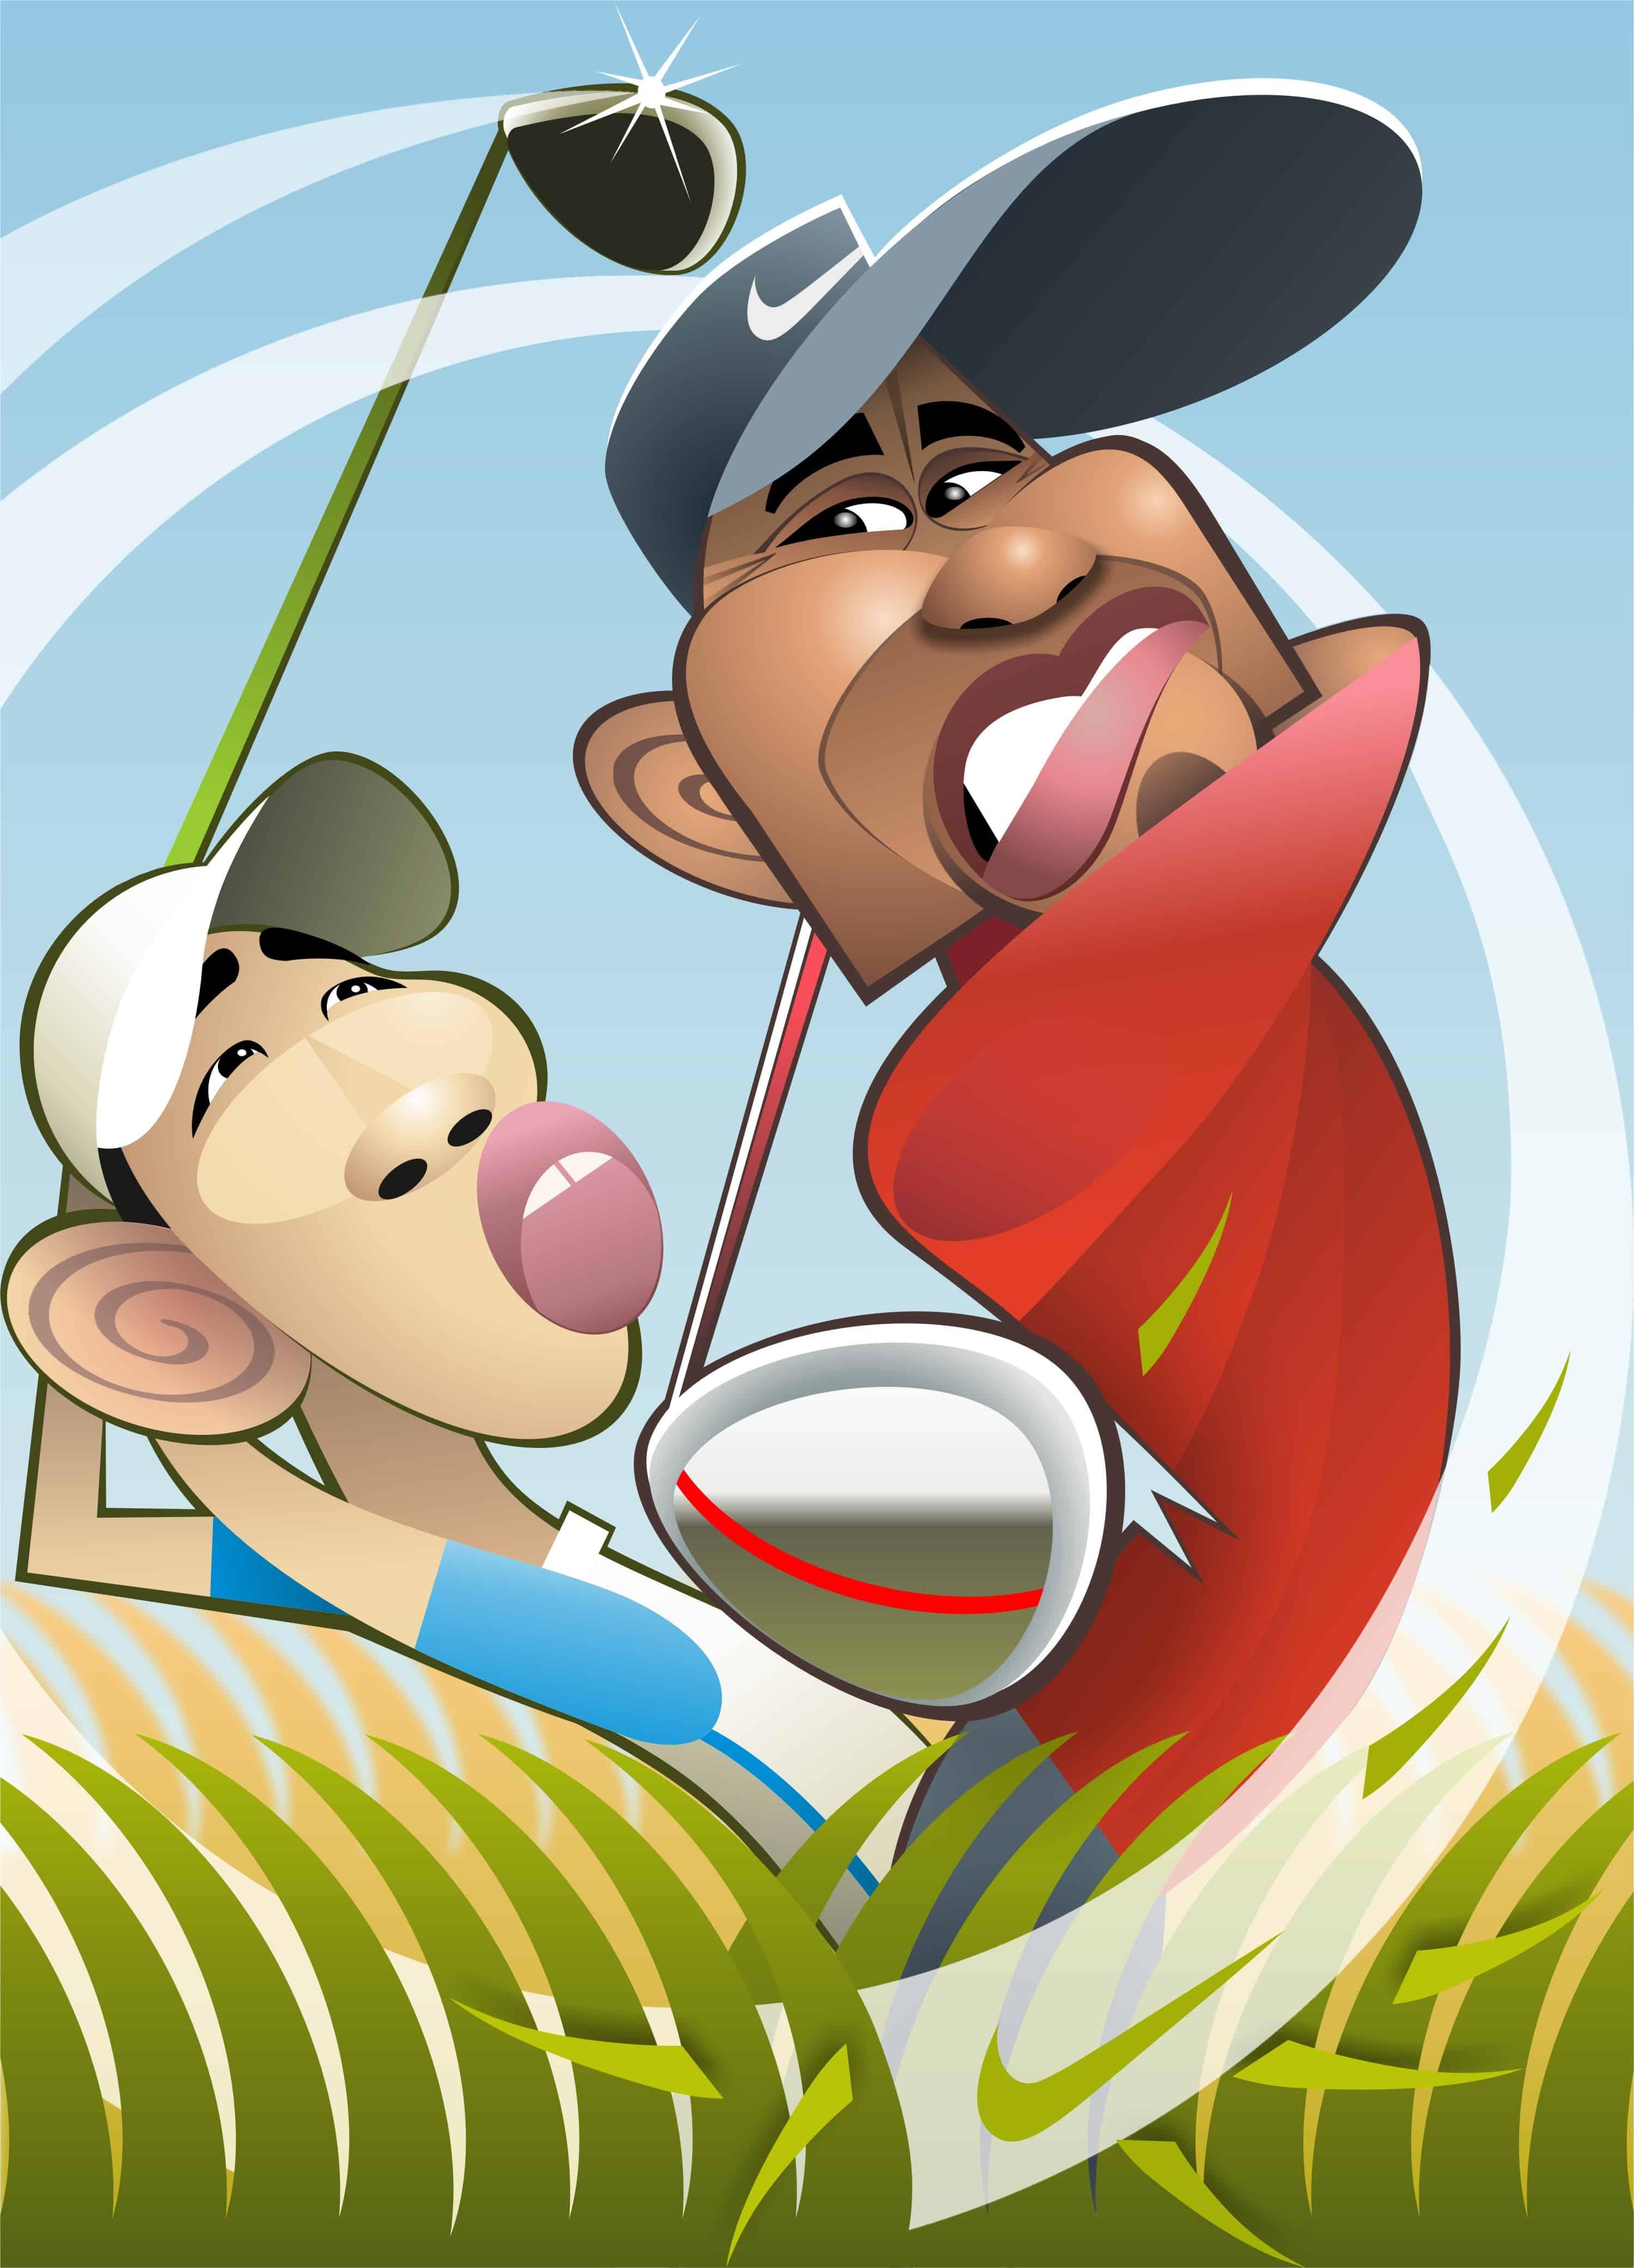 Tiger Woods & Guan Tianlang